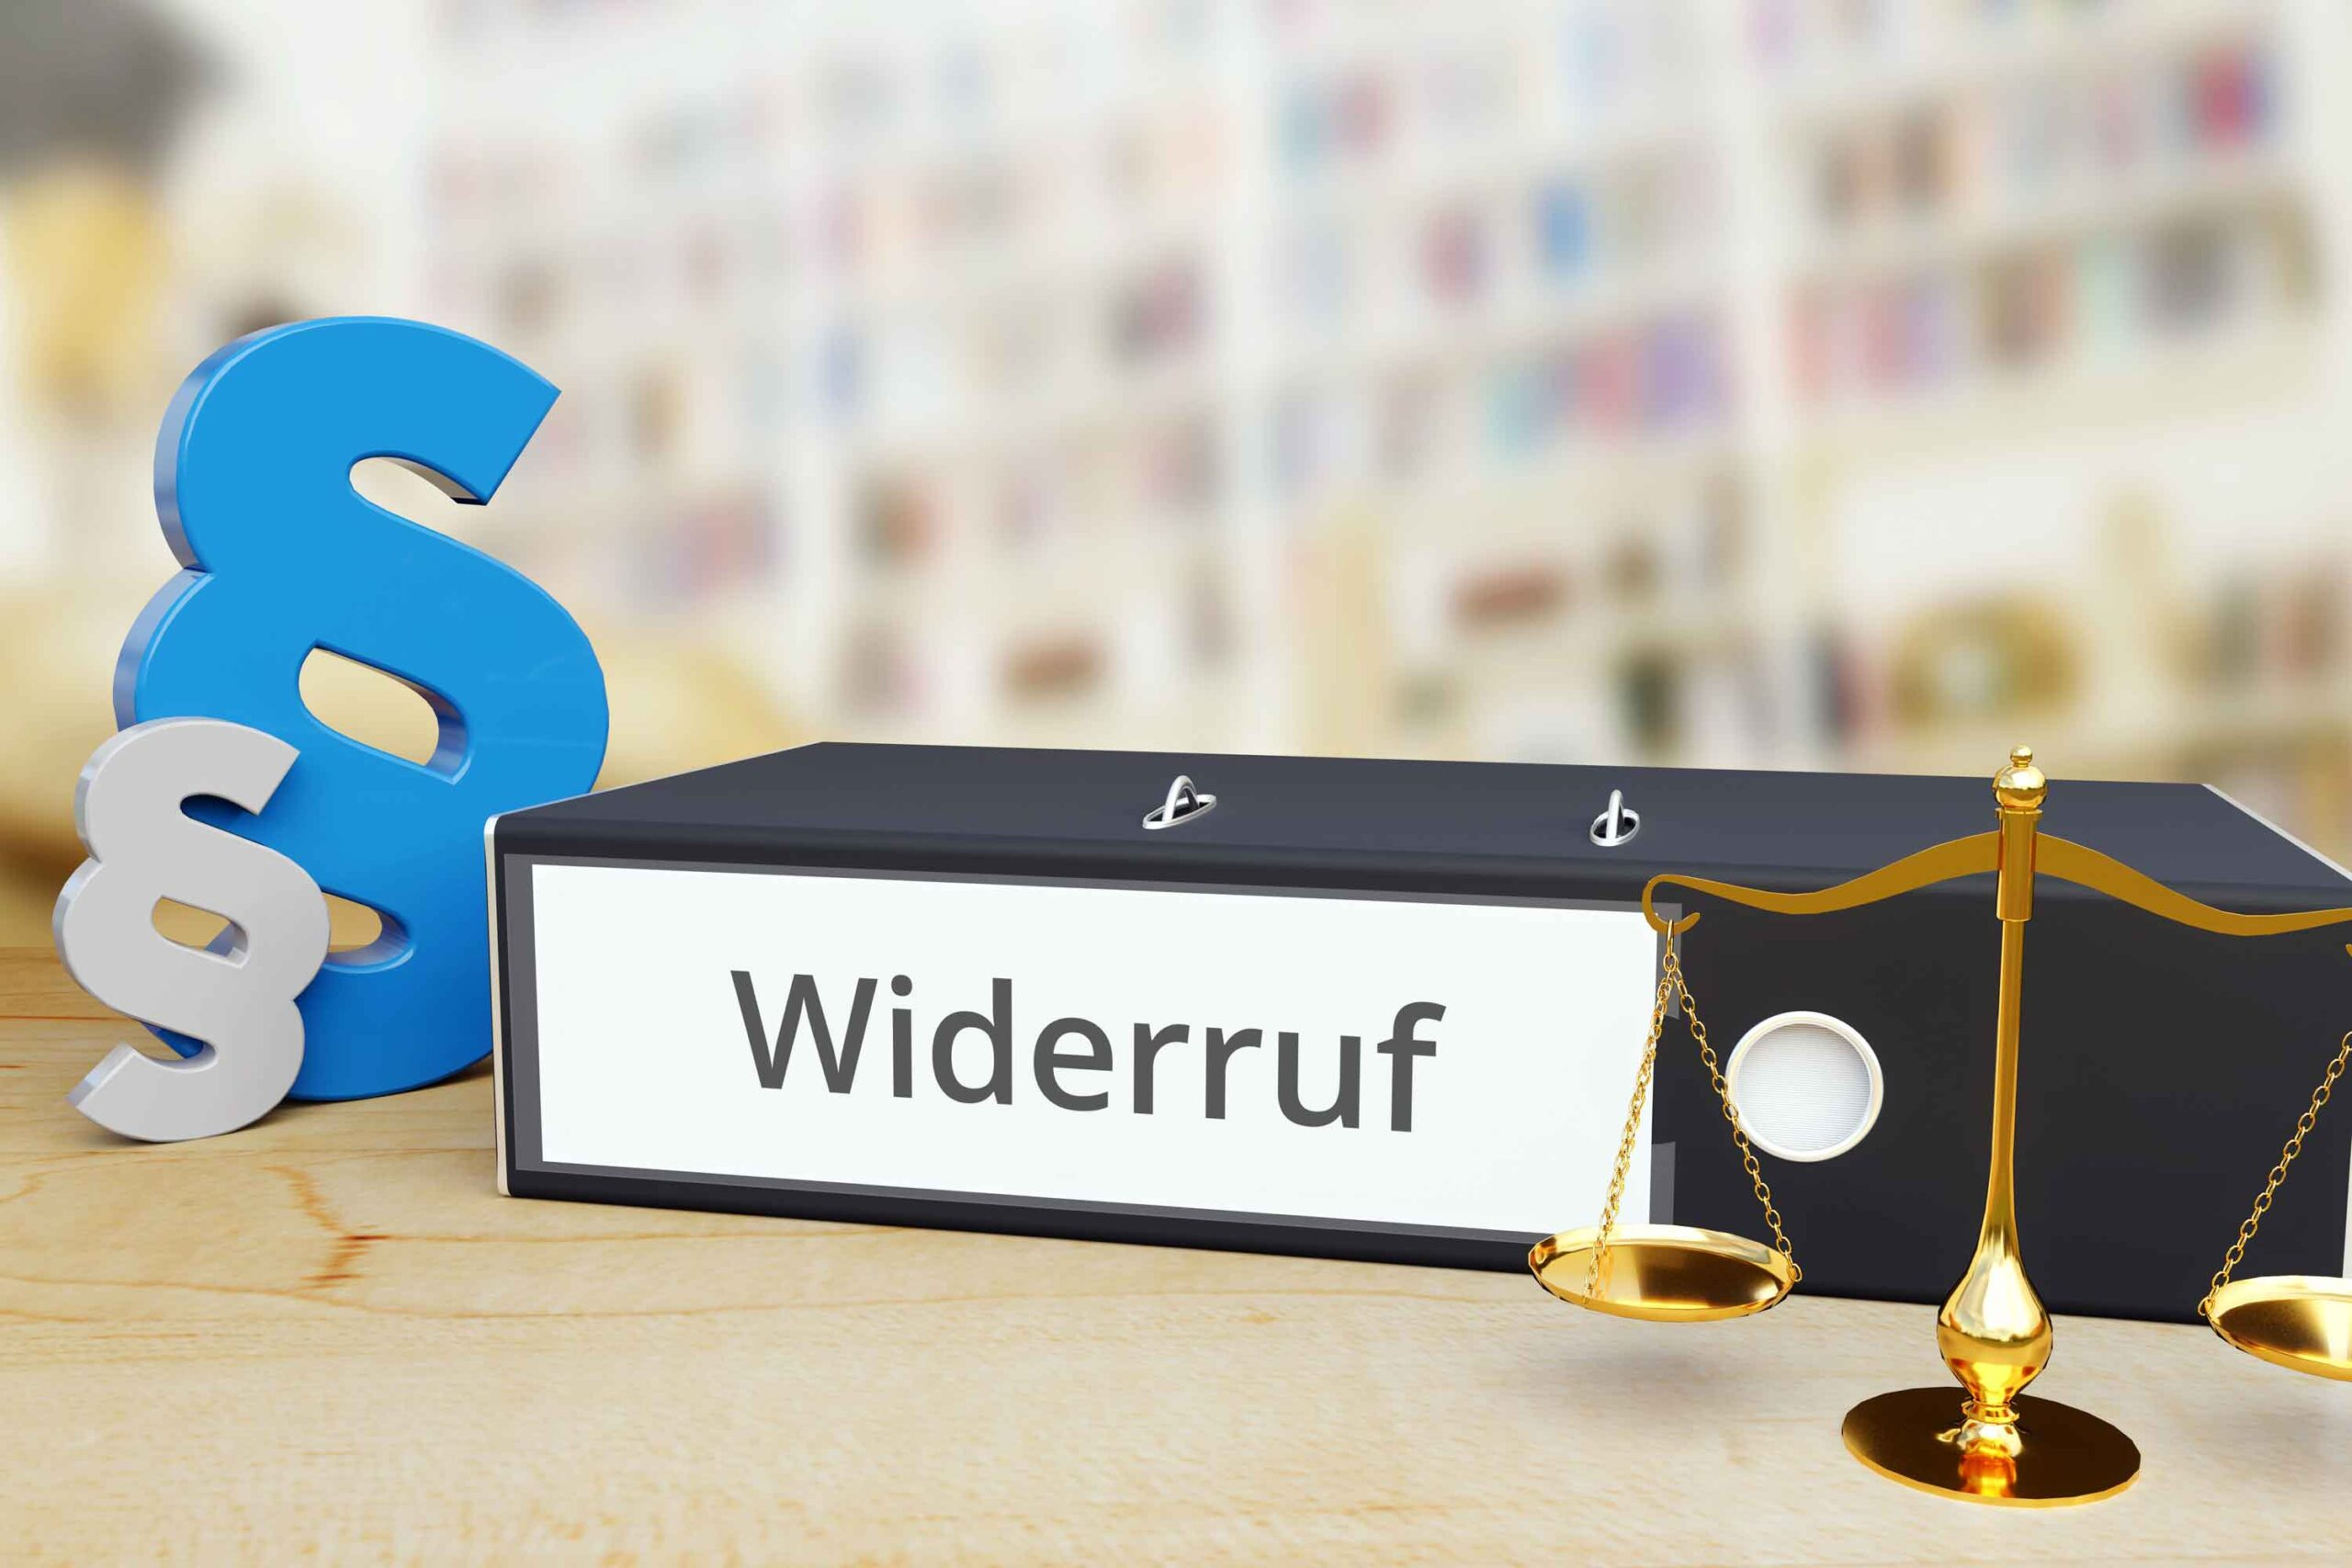 Widerruf Immobilieendarlehen - Quatriga-21.de - Hife bei Kreditkündigung-Zwangsversteigerung und Insolvenz